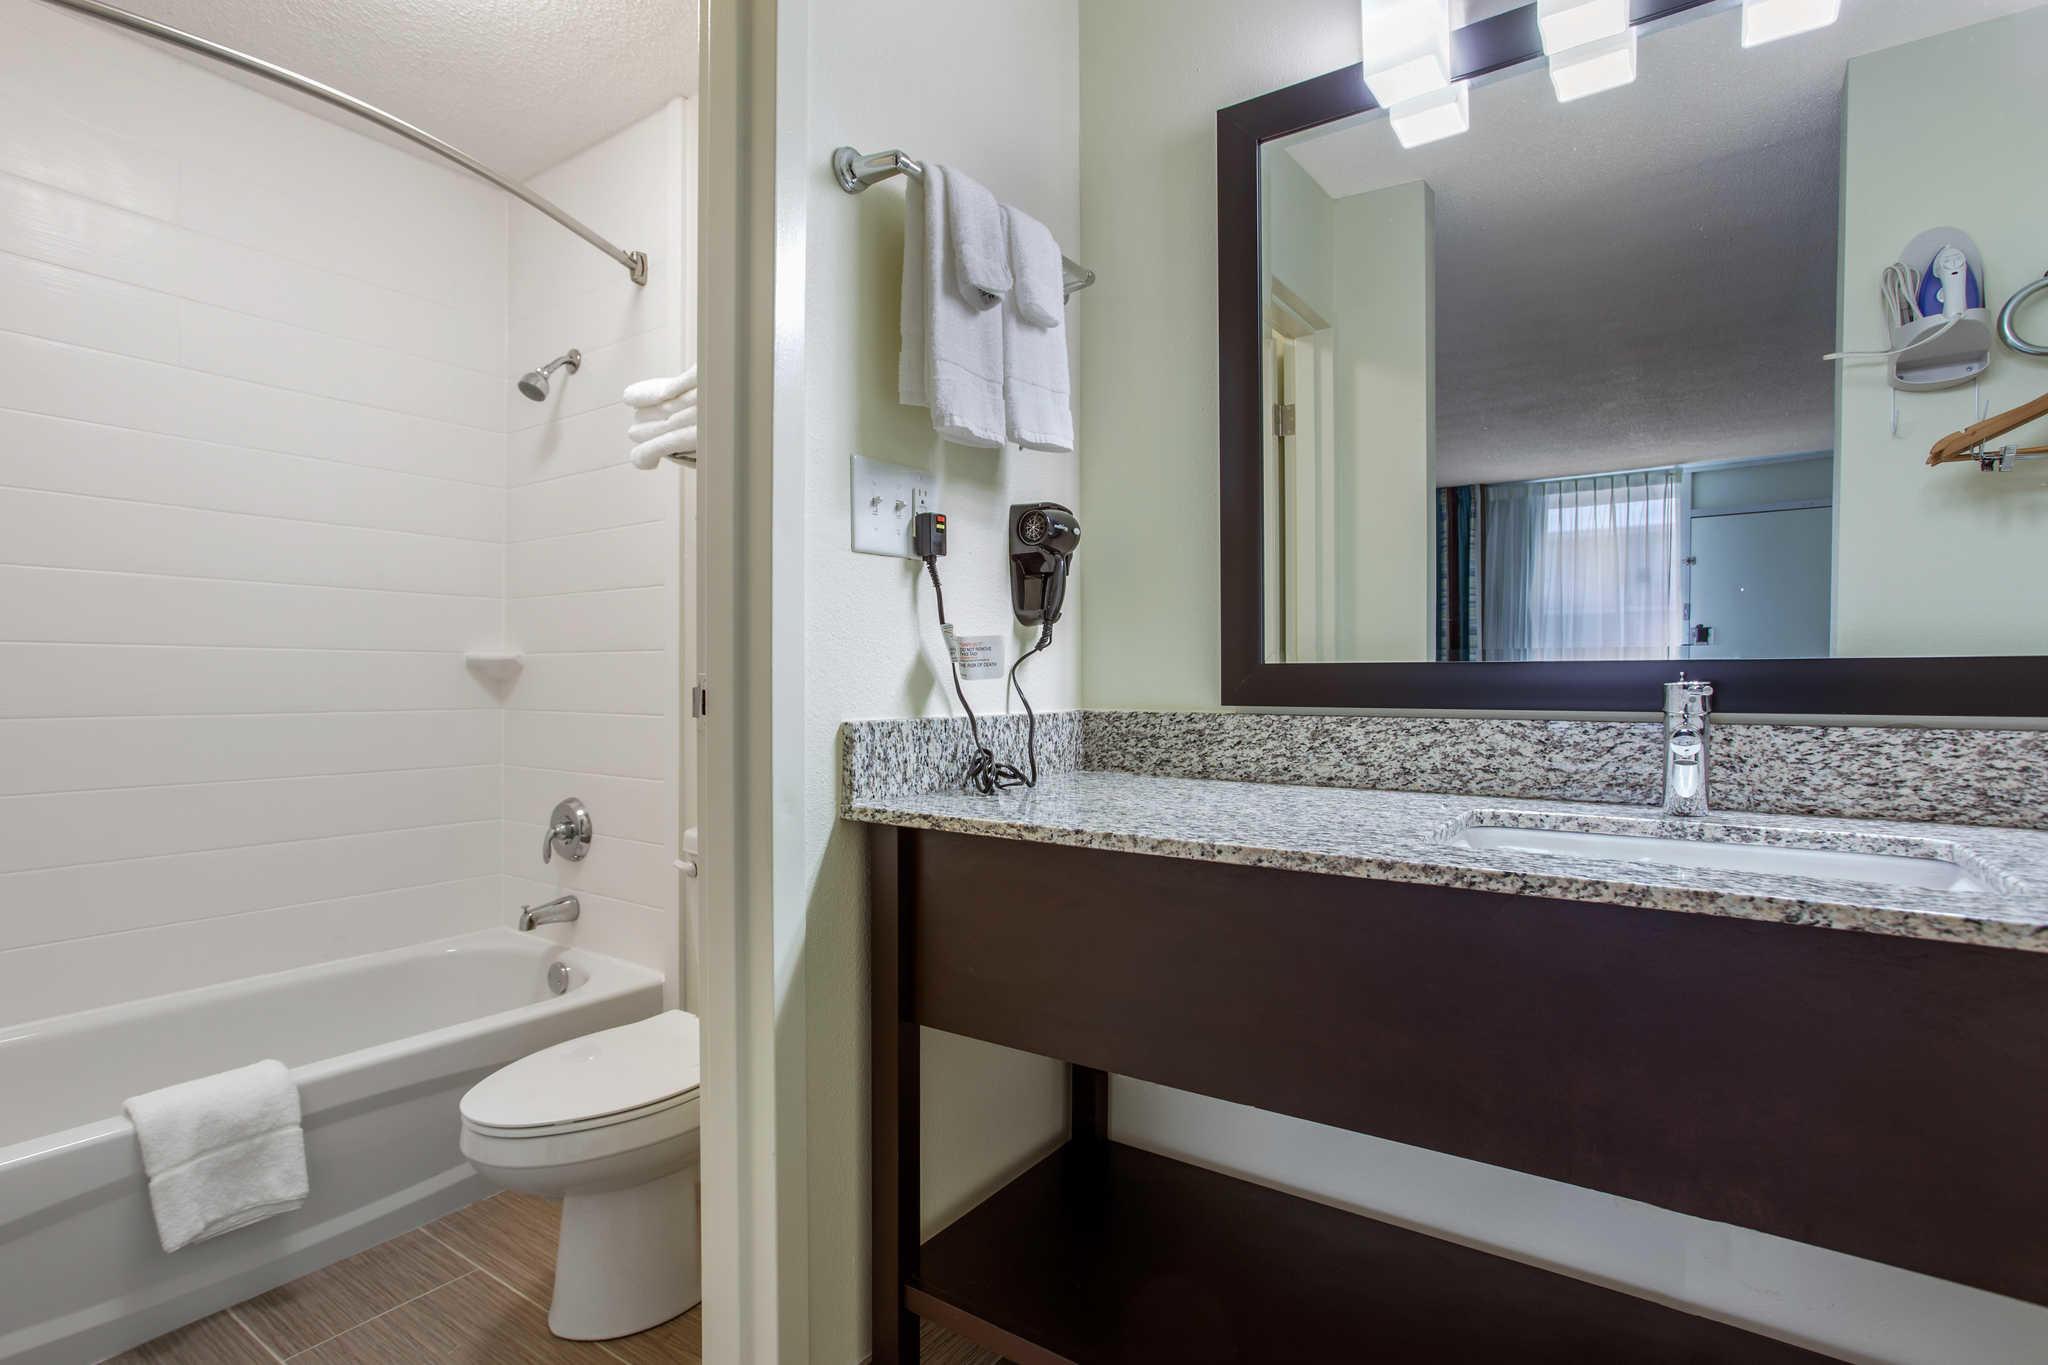 Clarion Inn & Suites image 22